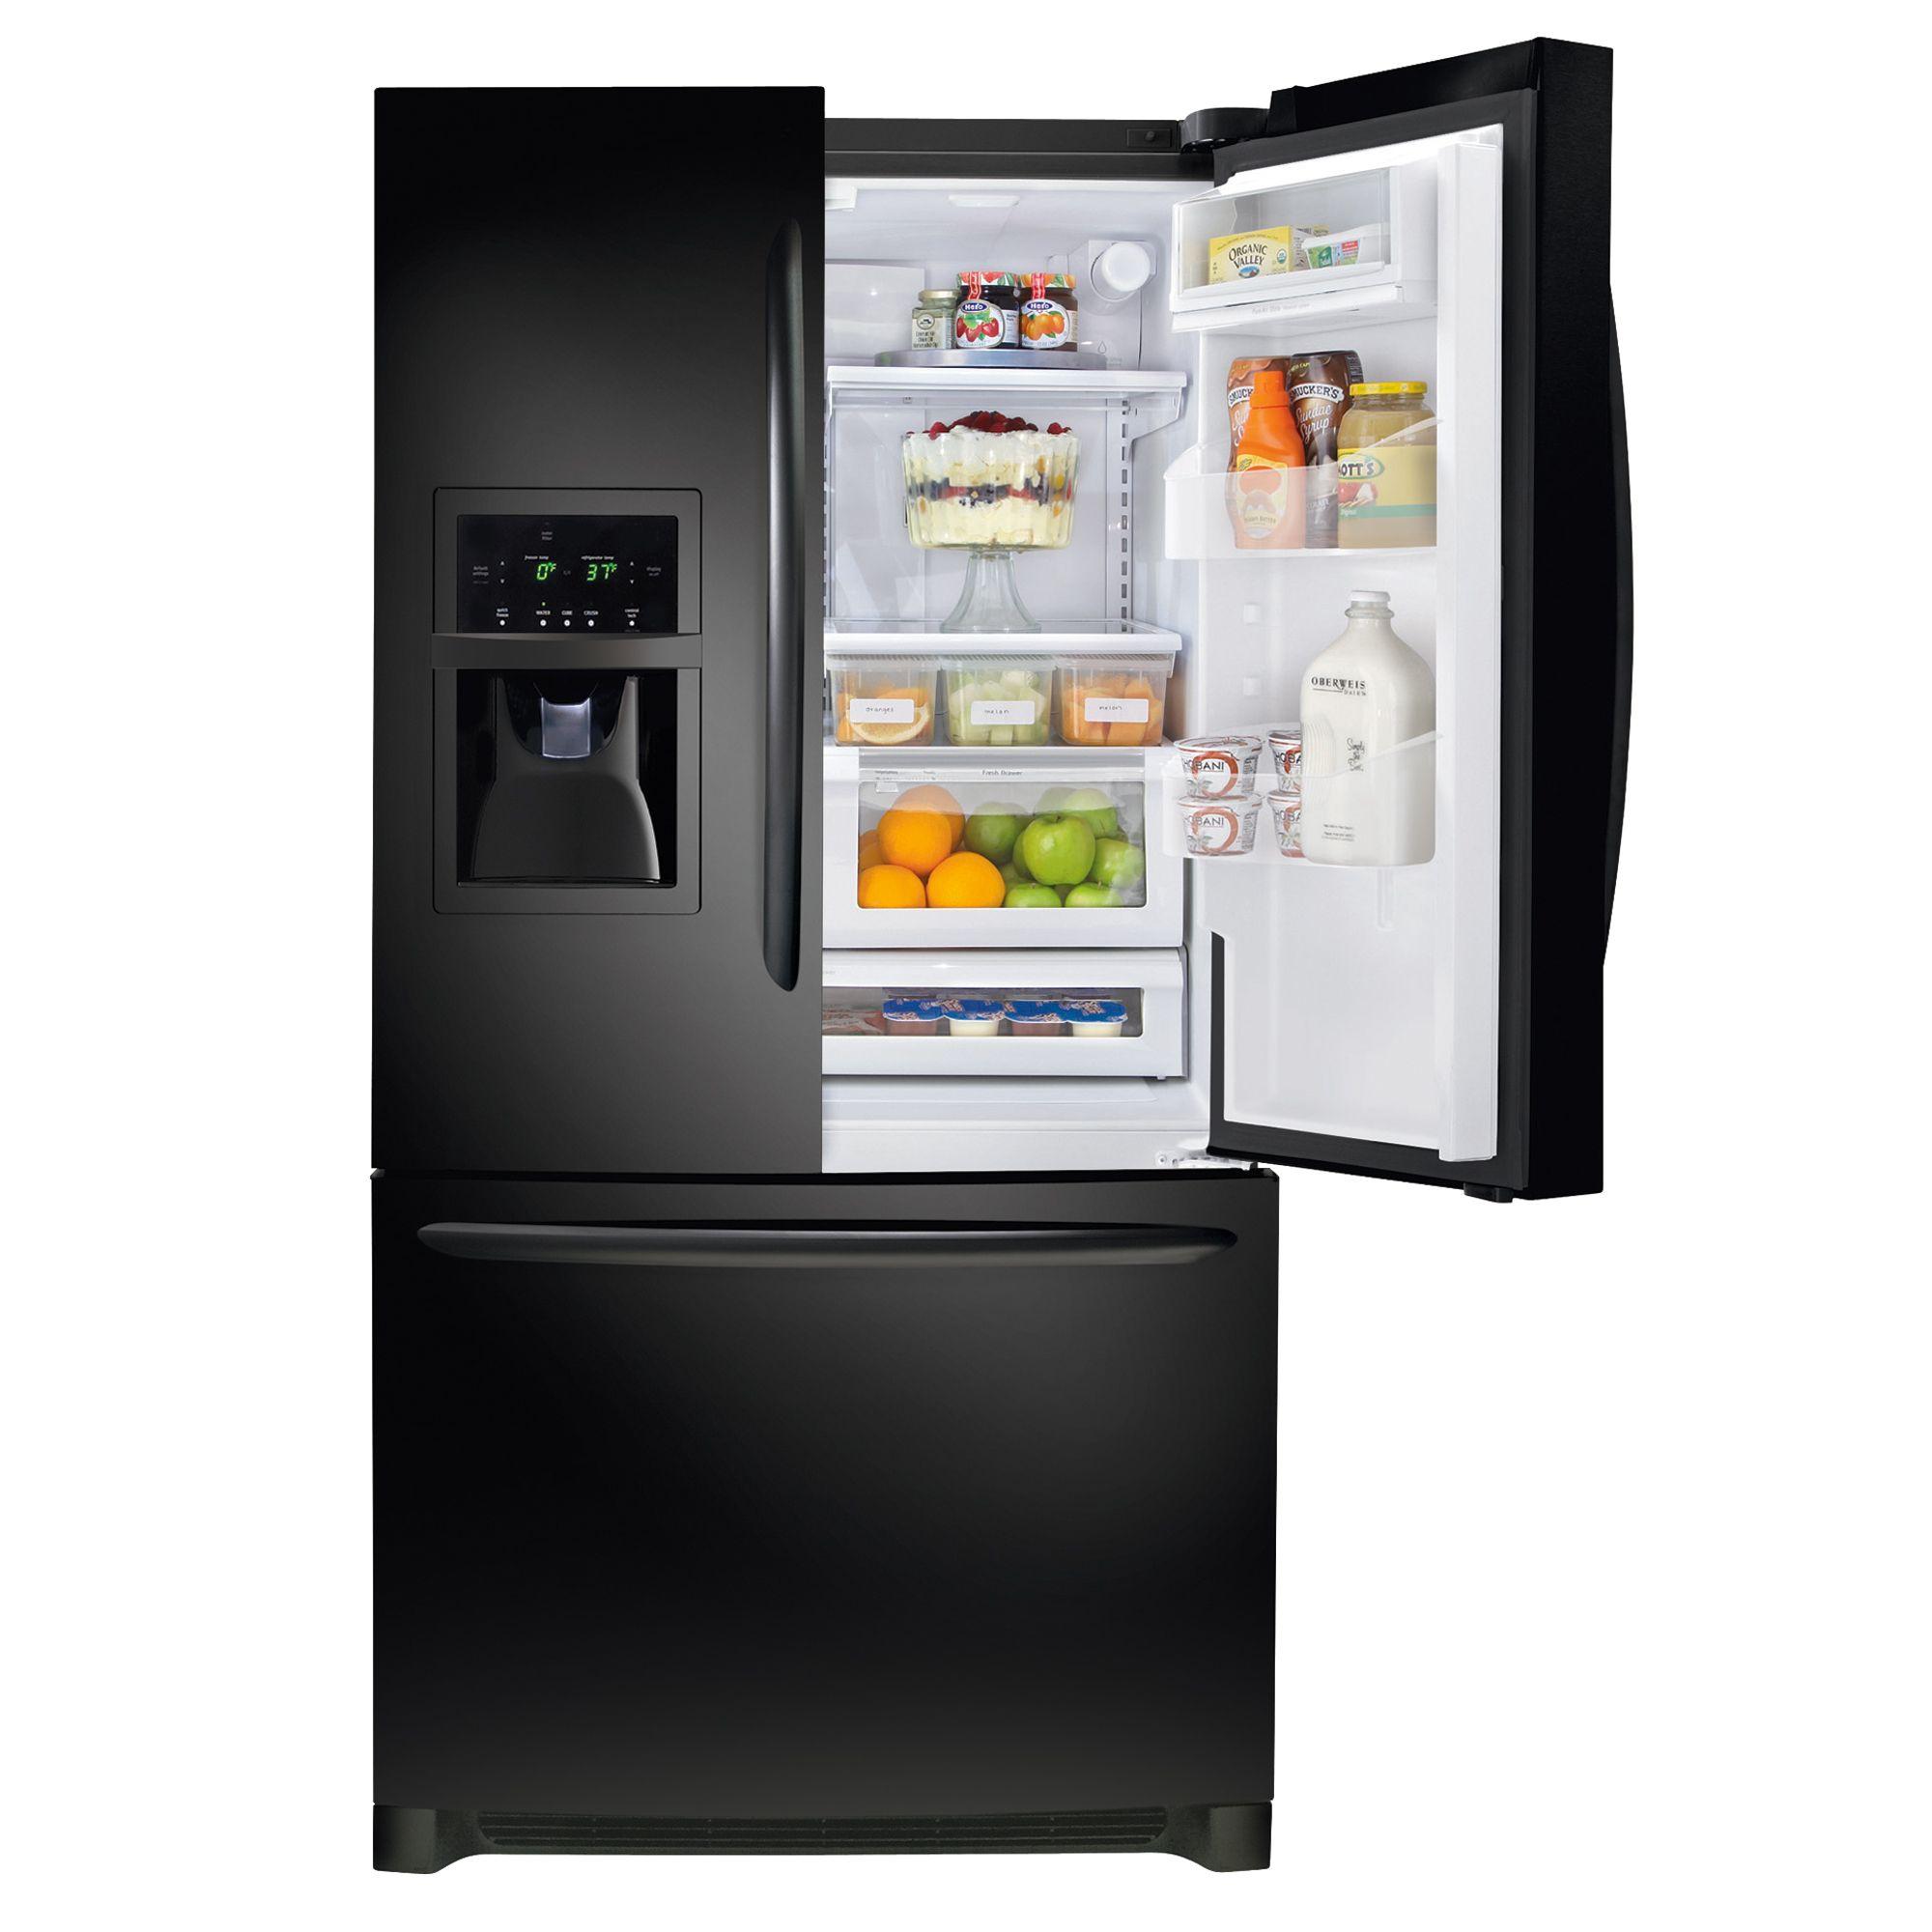 Frigidaire Gallery 25.8 cu. ft. French-Door Refrigerator - Ebony Black